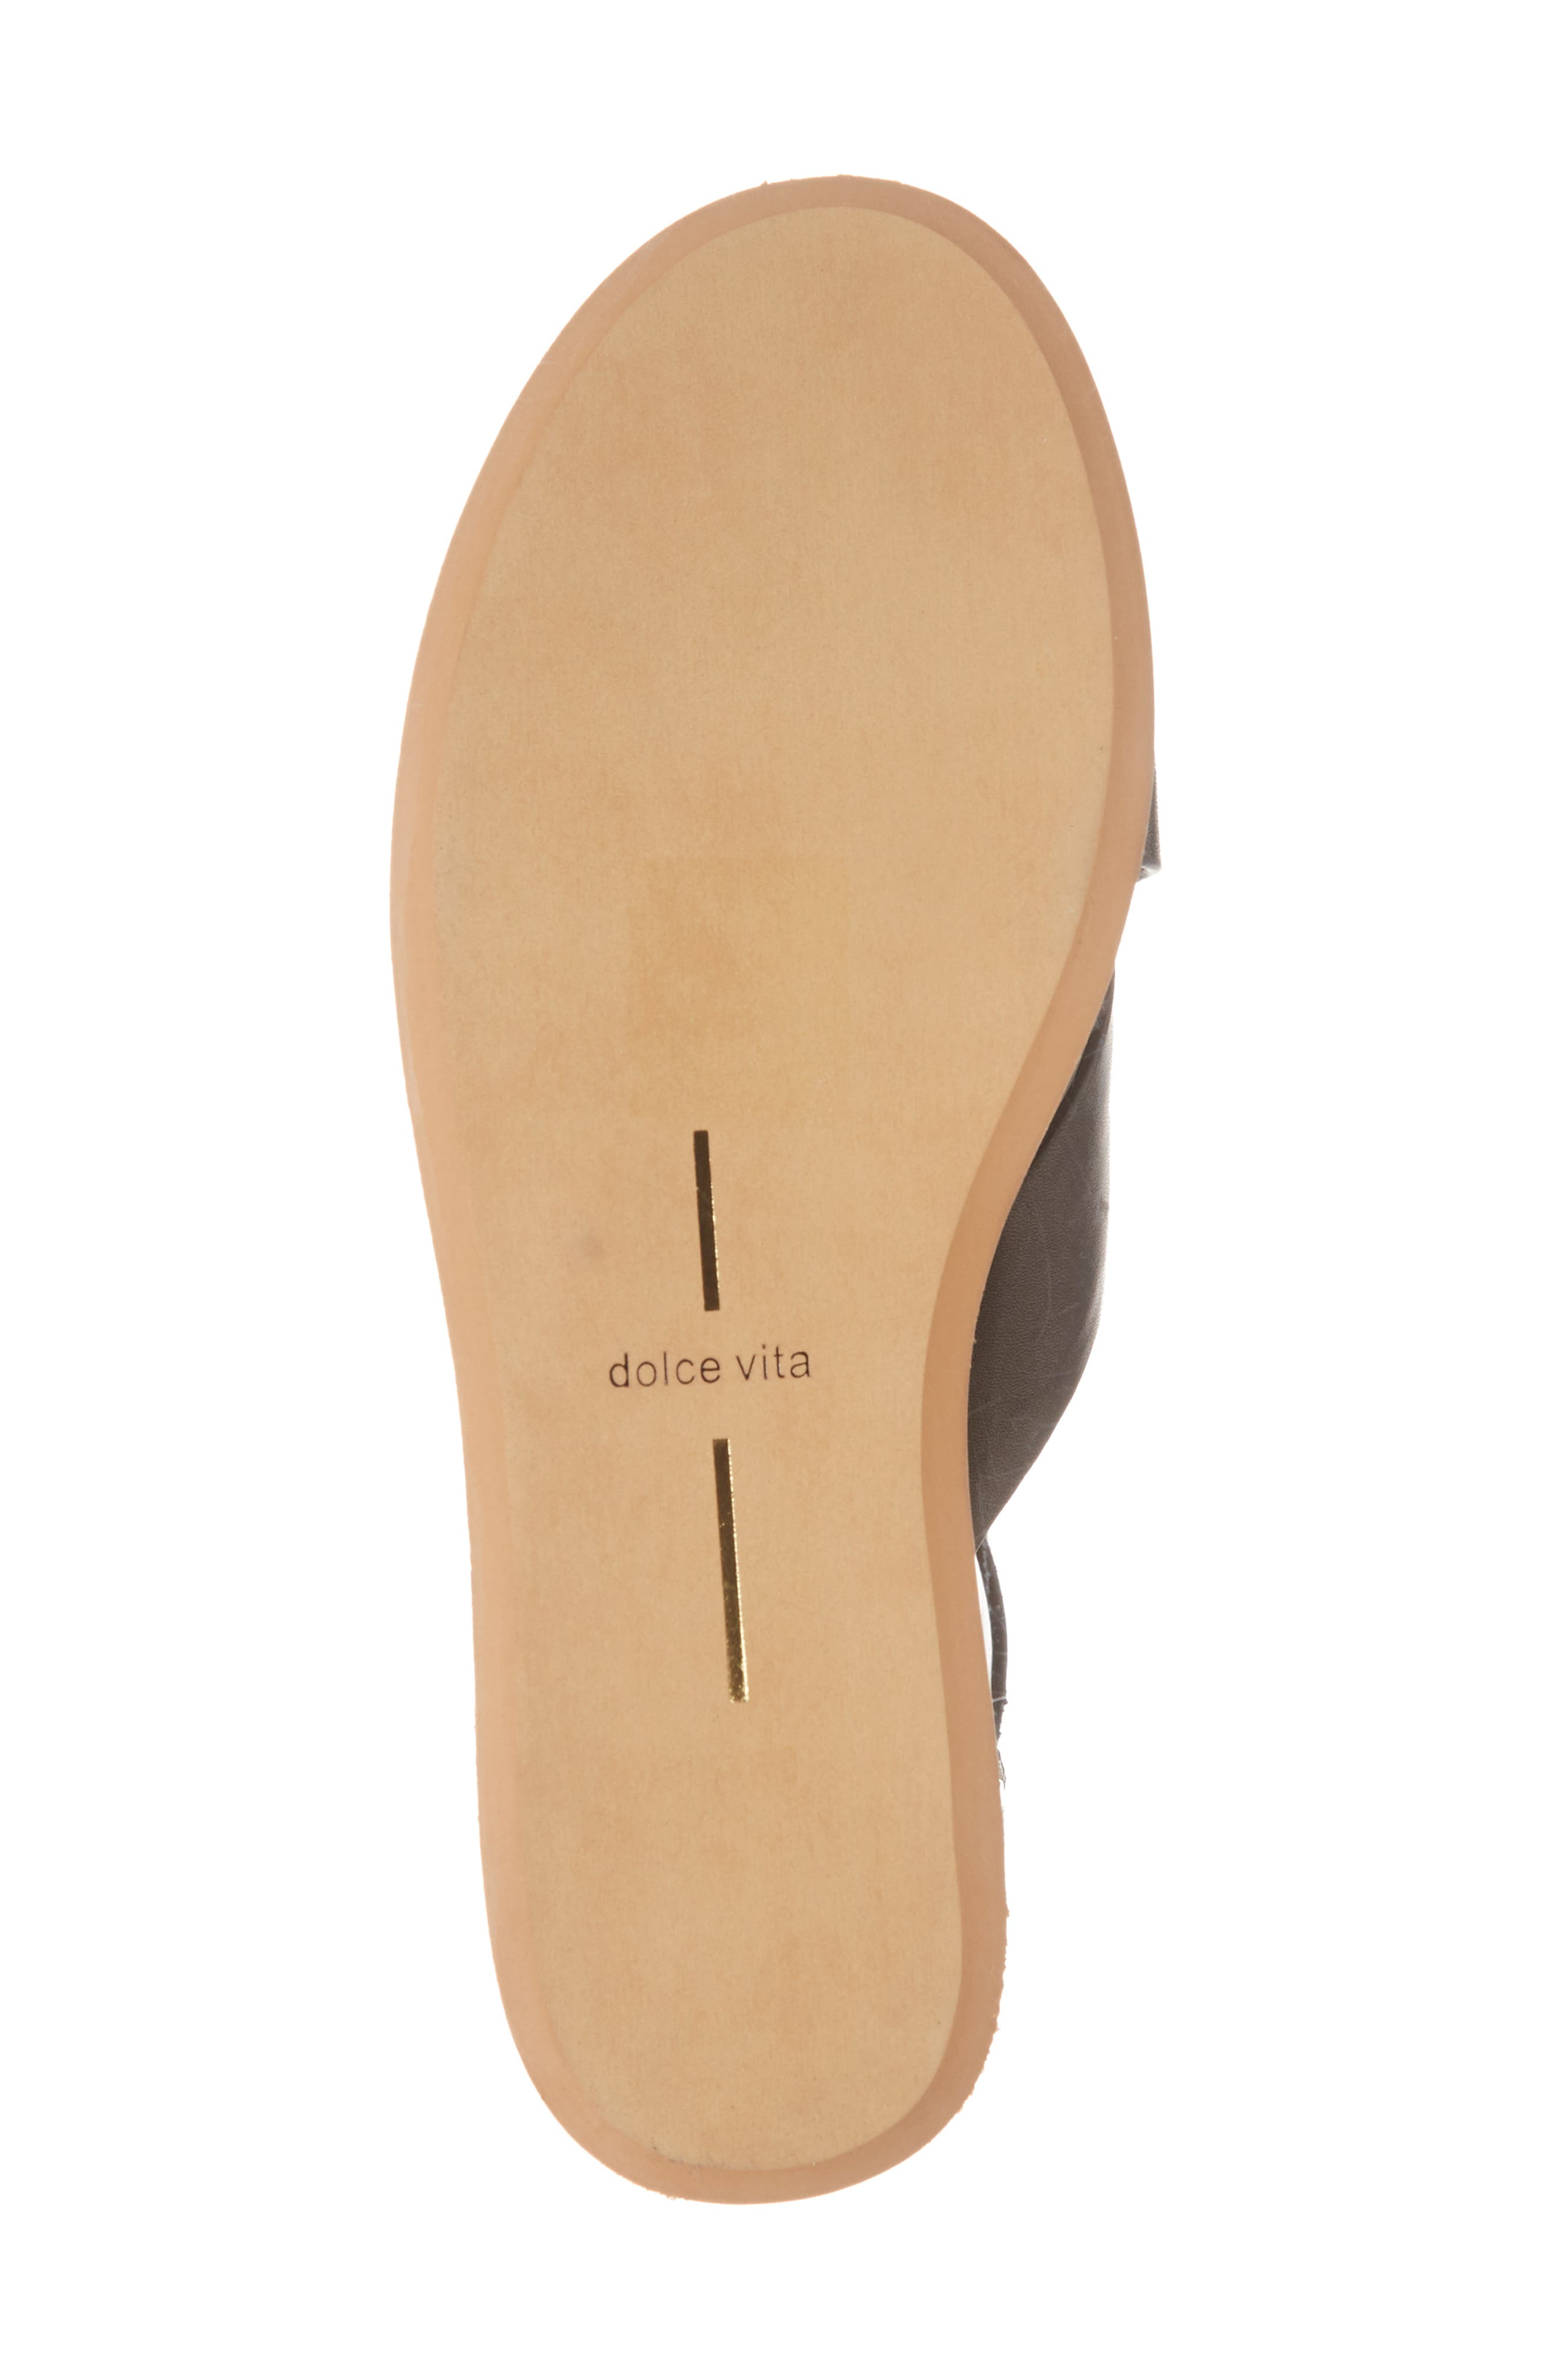 DOLCE VITA,                             Dalrae Platform Wedge Sandal,                             Alternate thumbnail 6, color,                             001